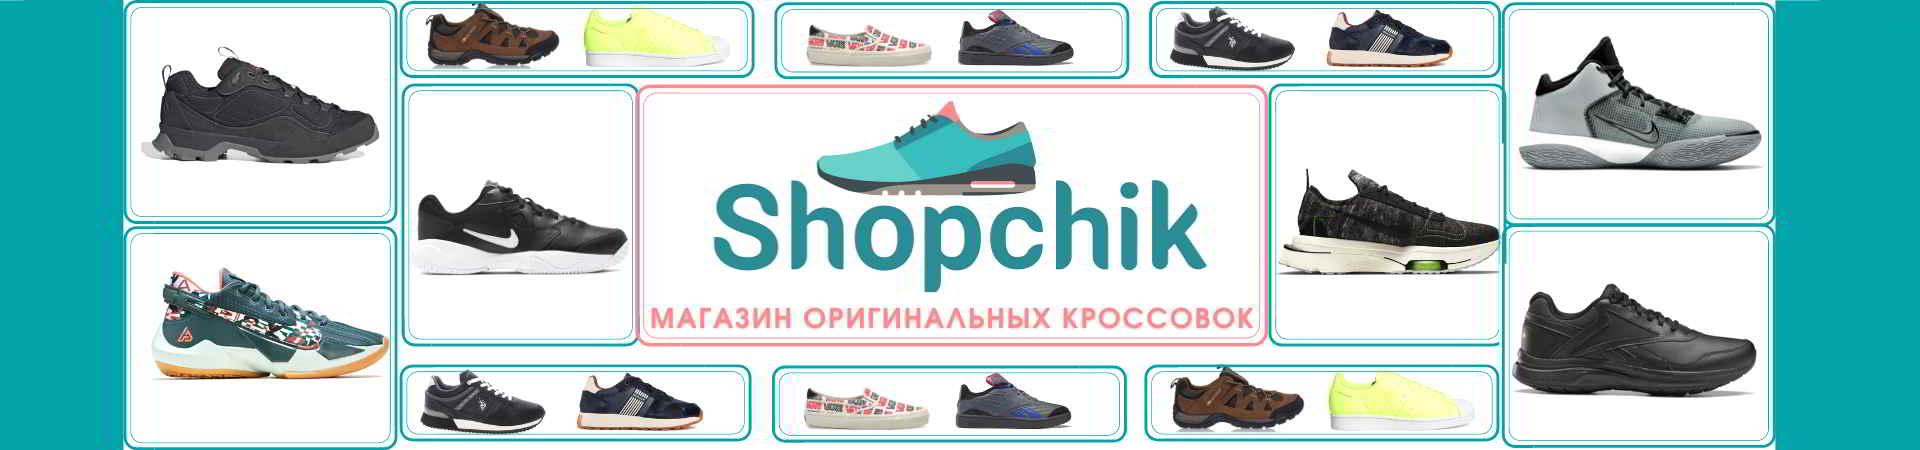 originalnie-krossovki-v-odesse-shopchik